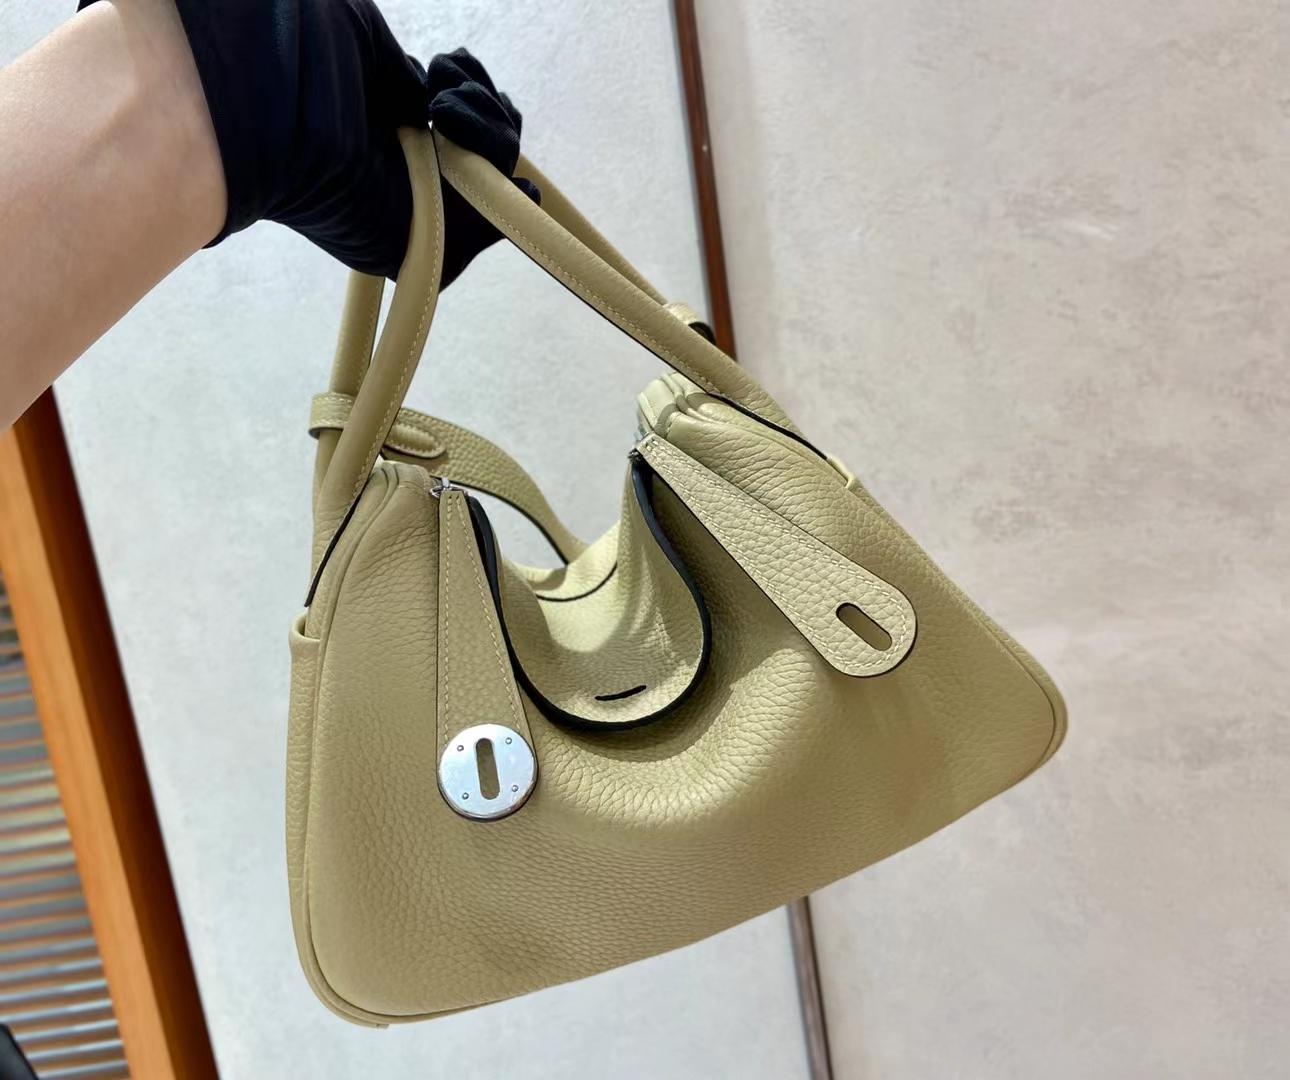 Hermès(爱马仕)Lindy 琳迪包 TC S2 风衣灰 26cm 银扣 顶级现货